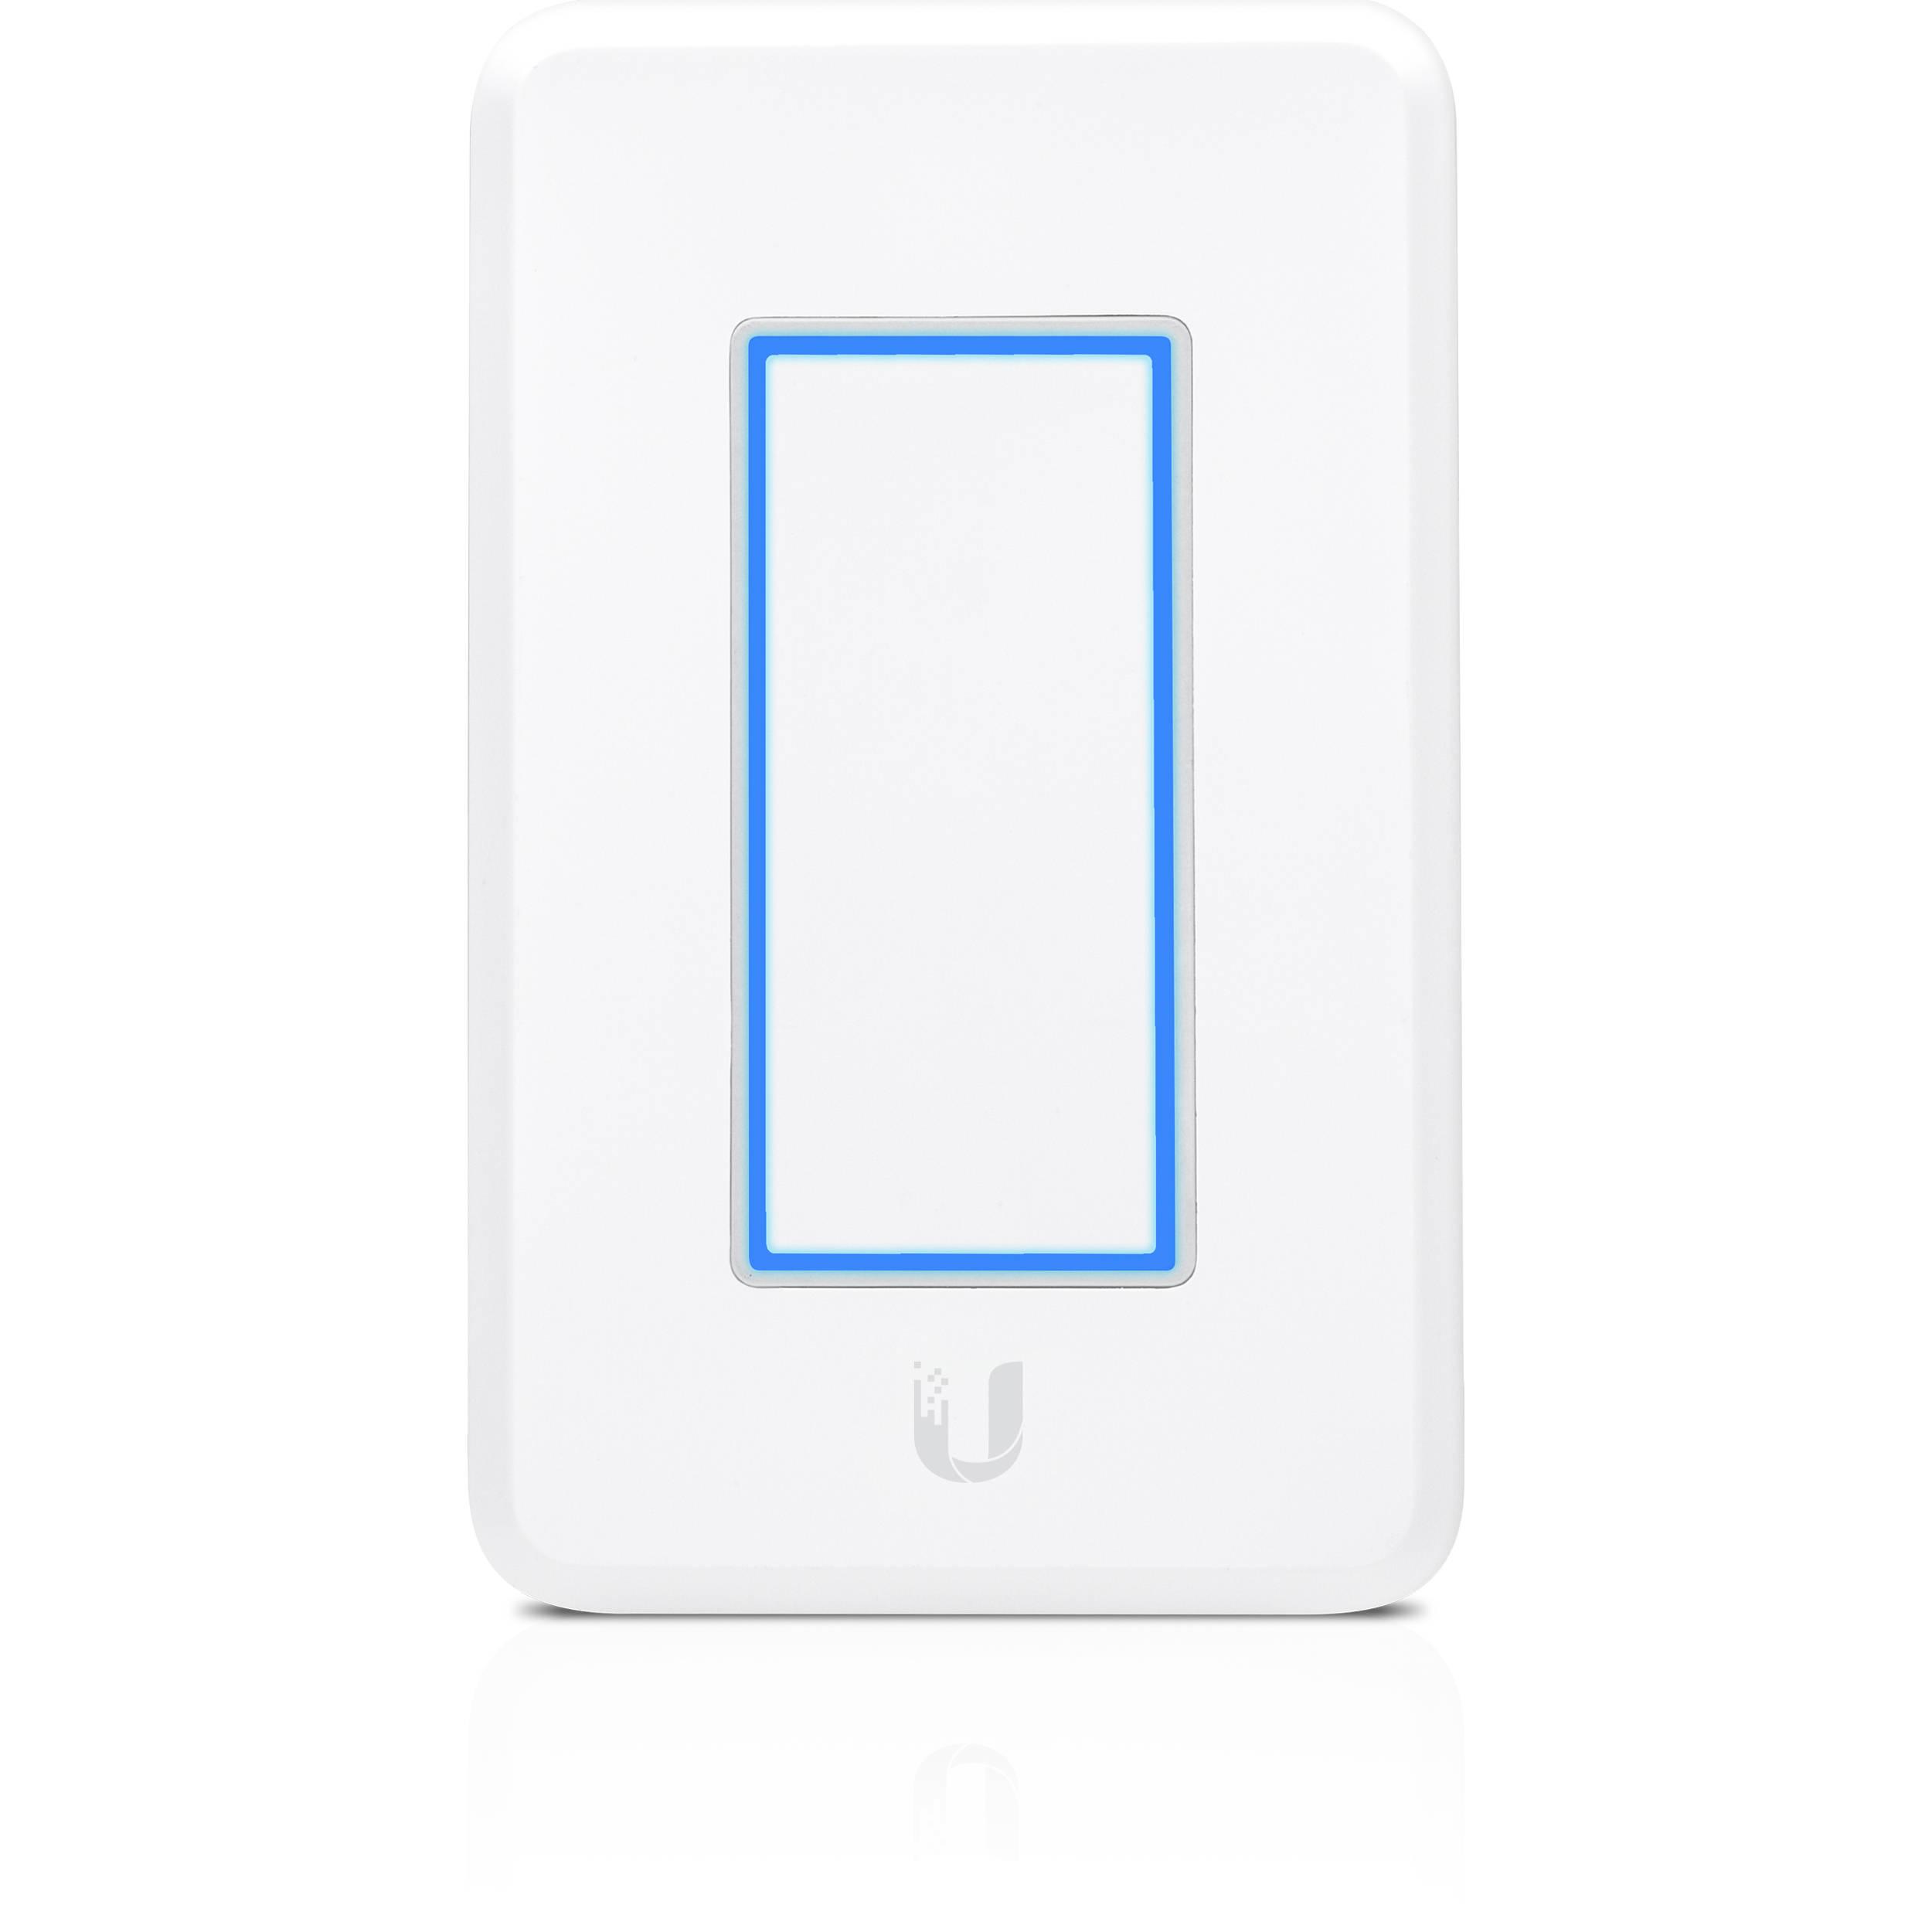 UDIM-AT UniFi Dimmer Switch UDIM-AT